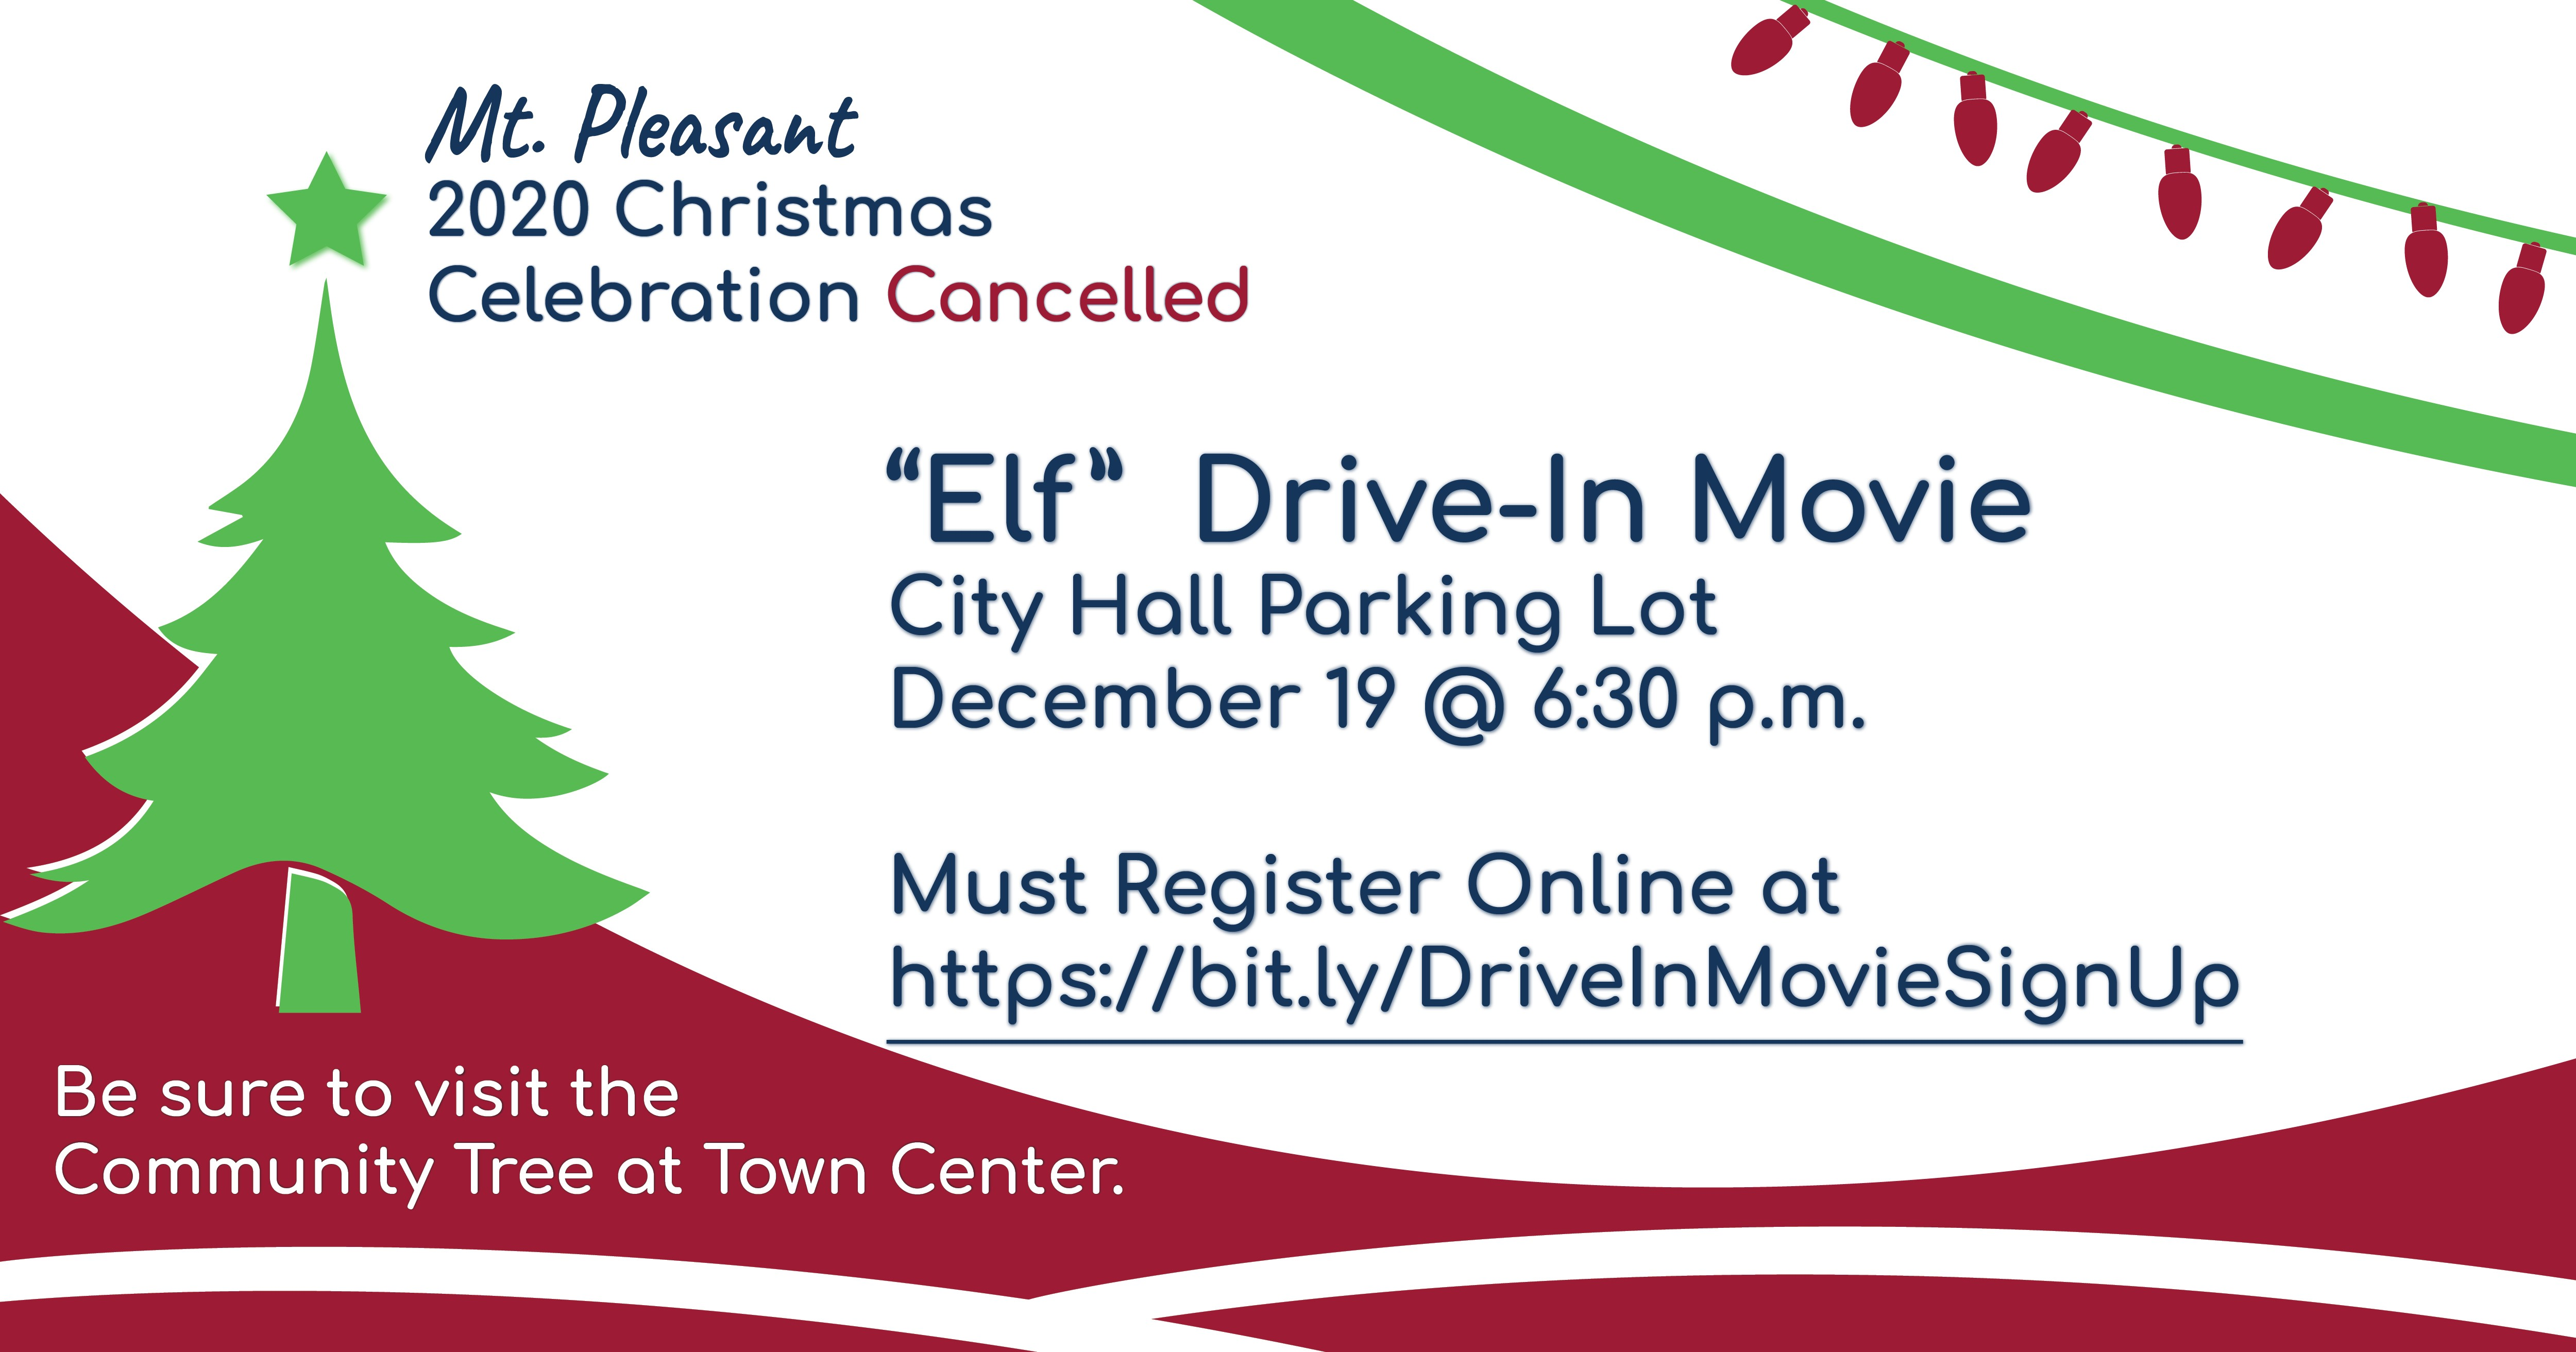 Celebration Of Christmas 2020, December 19 Mt. Pleasant Christmas Celebration Cancelled (Updated 11/20/2020